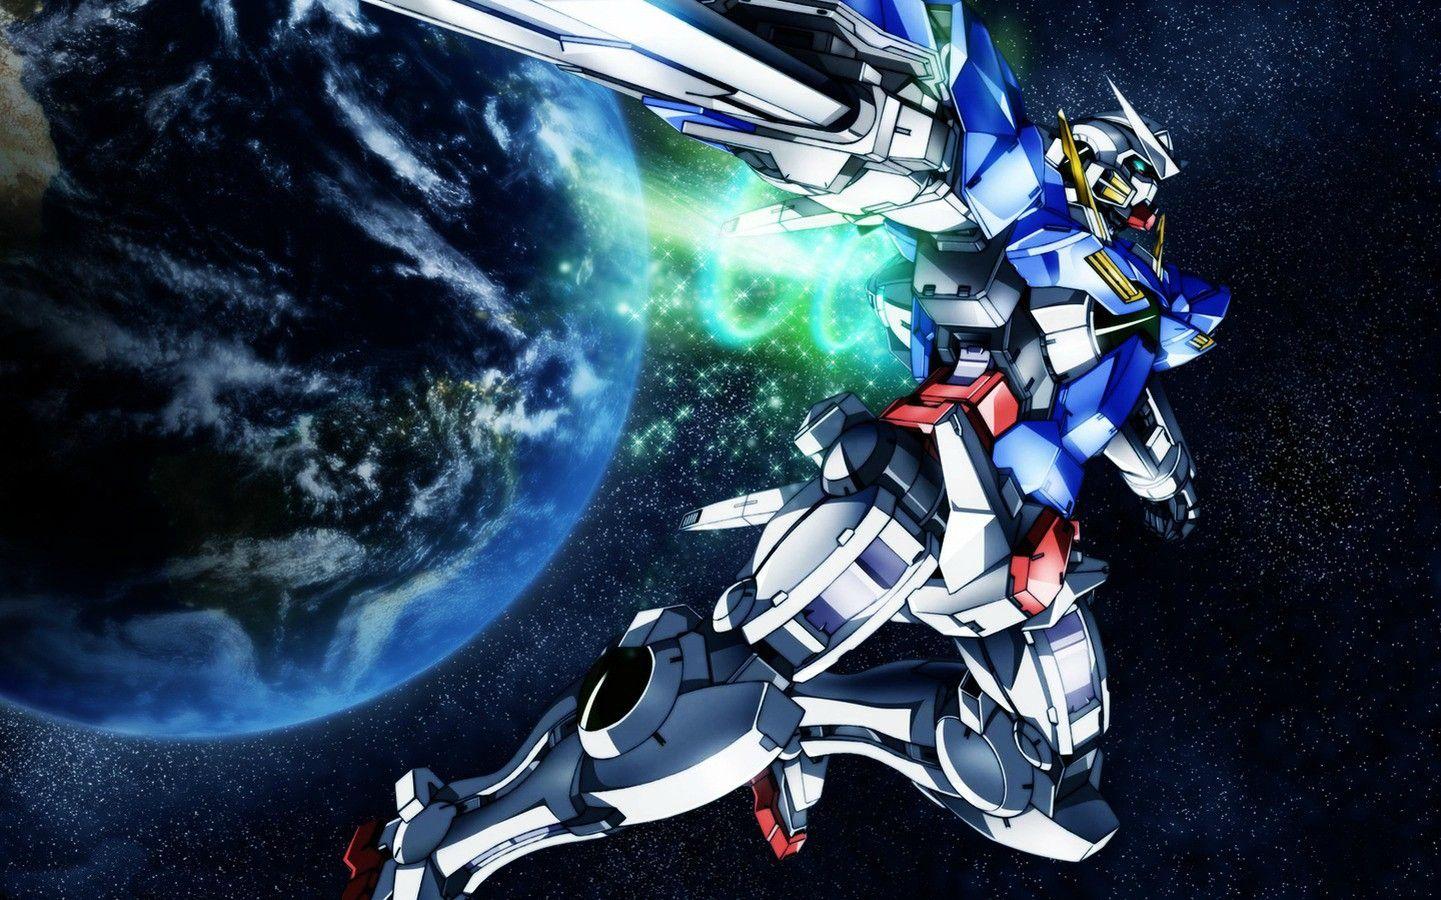 Gundam Exia Wallpaper Hd Wallpapers Gundam Wallpapers